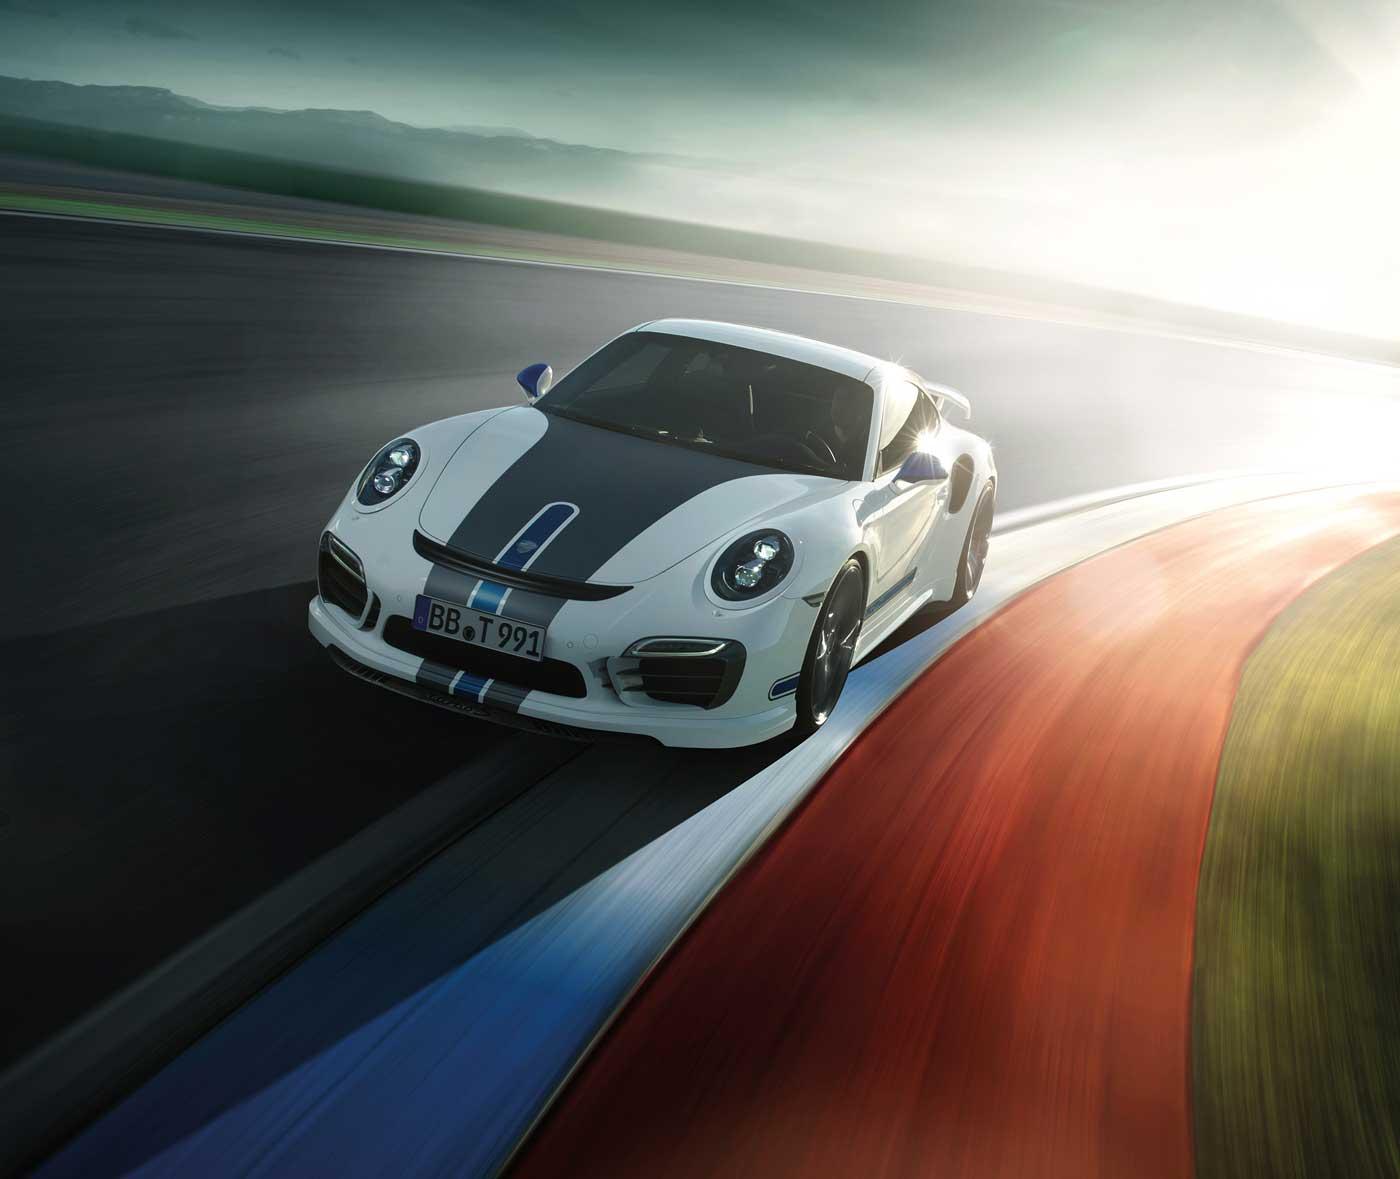 Independent Porsche Specialists, Servicing & Parts | Tech 9